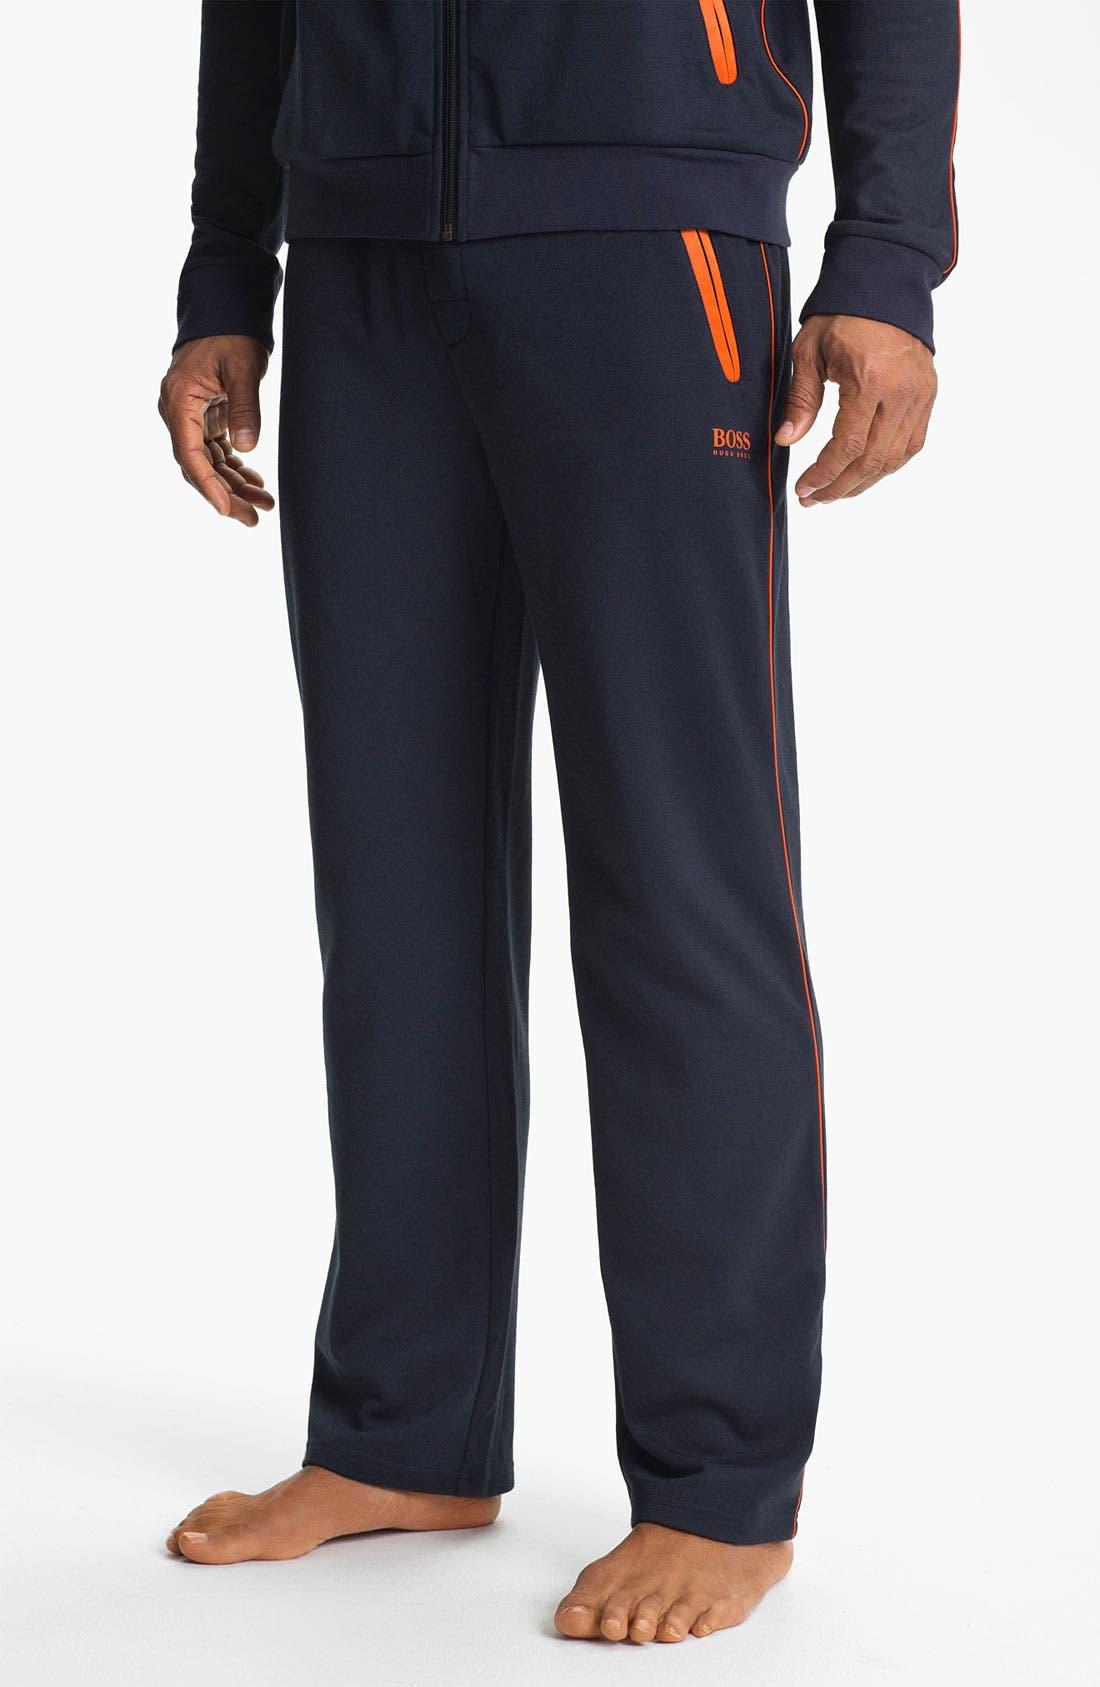 Alternate Image 1 Selected - BOSS Black 'Innovation 5' Pants